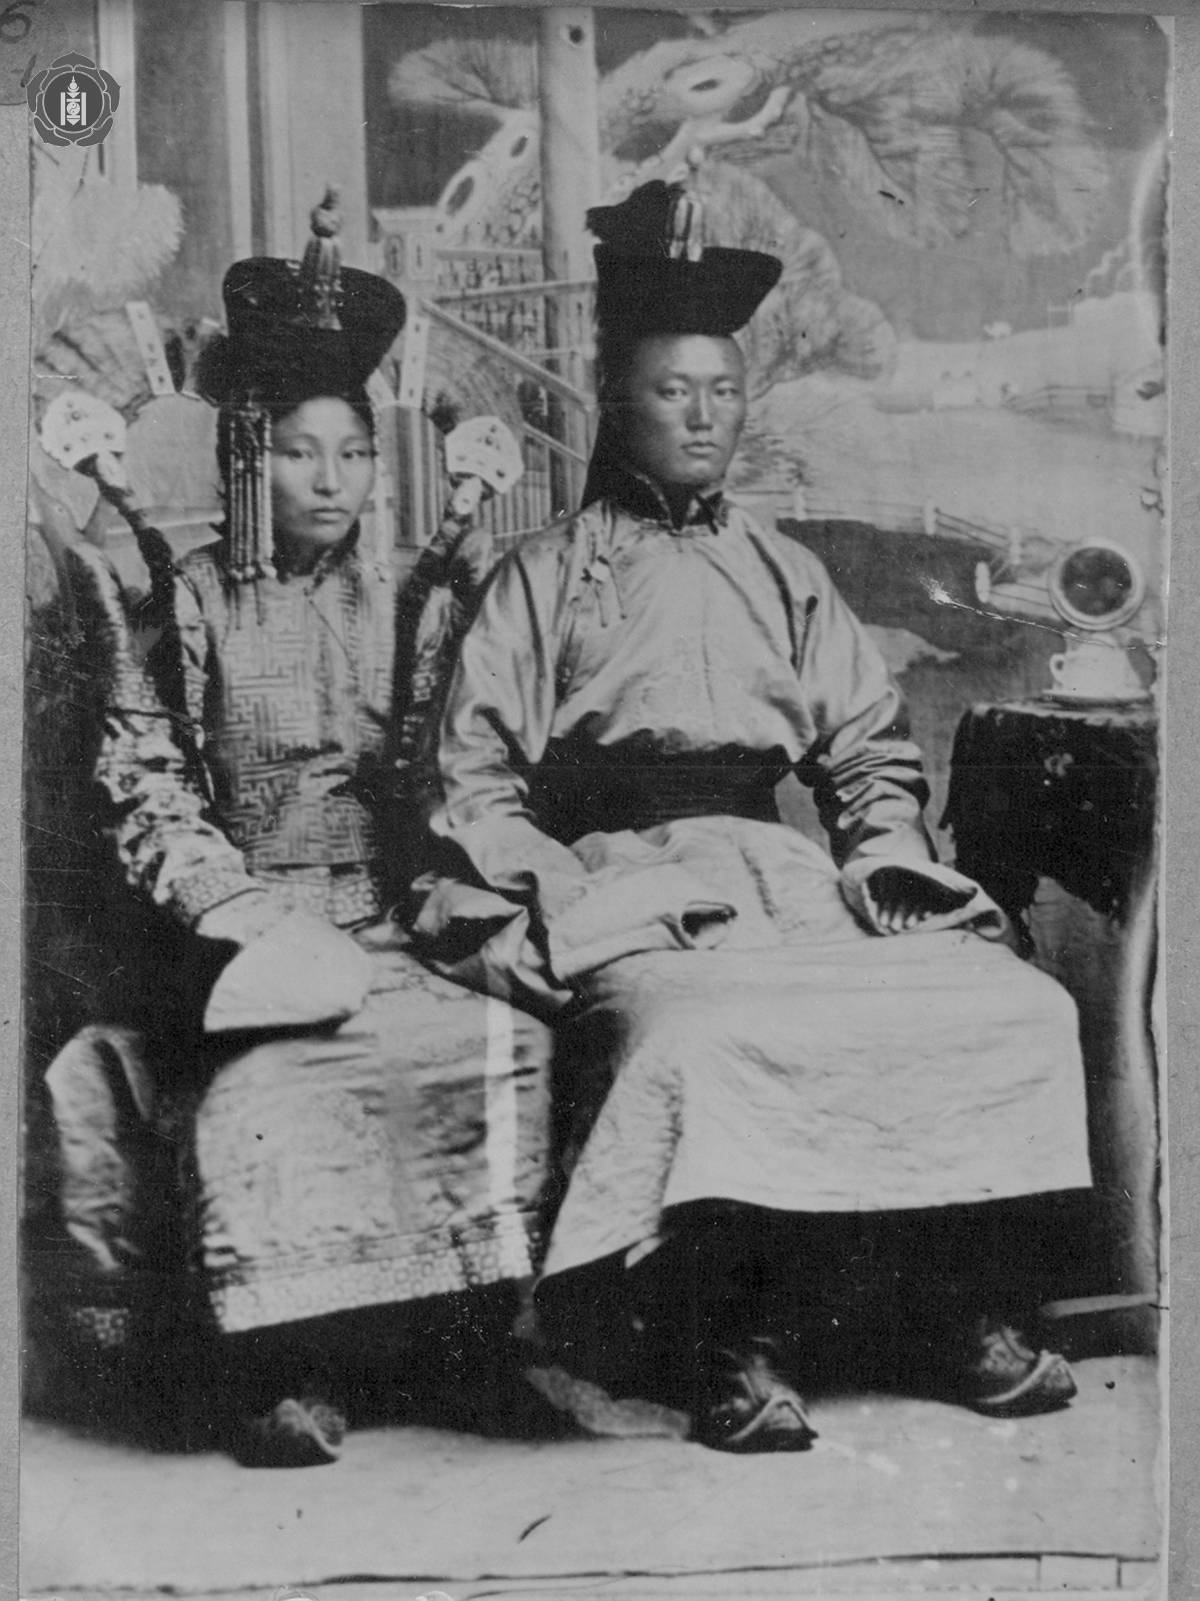 File:YanjmaaAndSukhbaatar.jpg